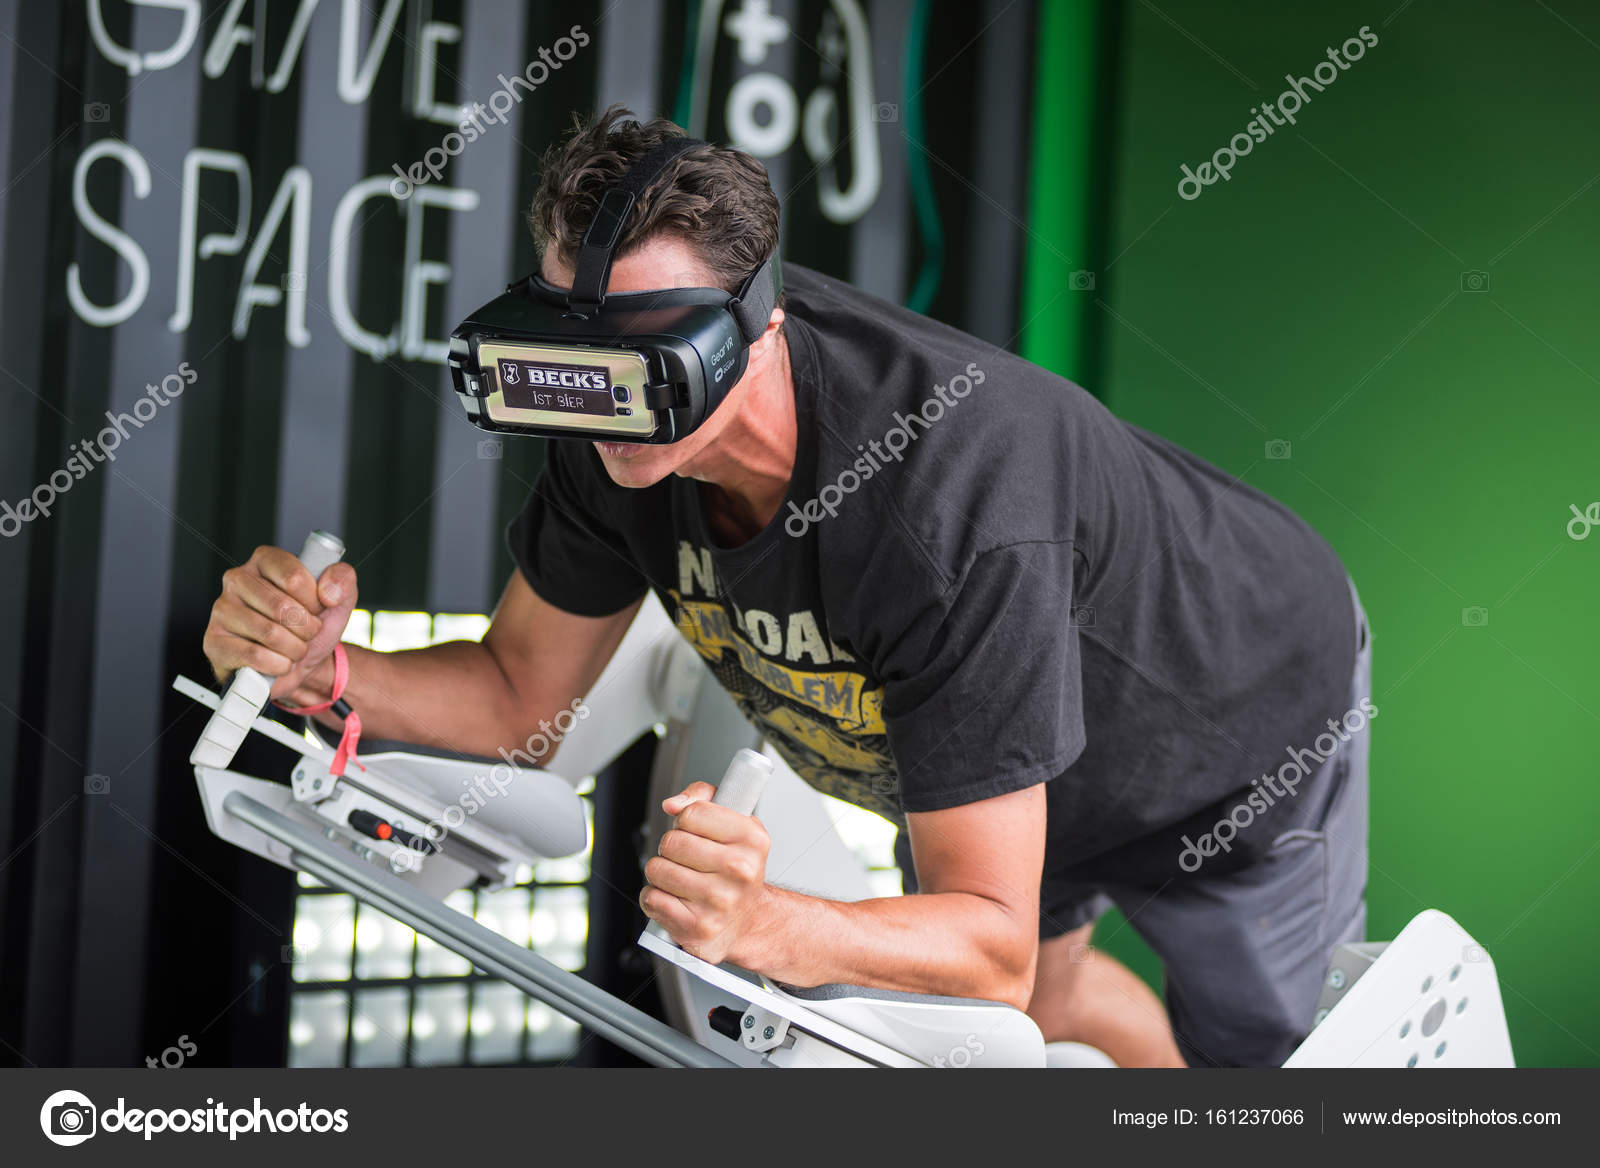 df84d7292e9 Guy using Samsung virtual reality headset